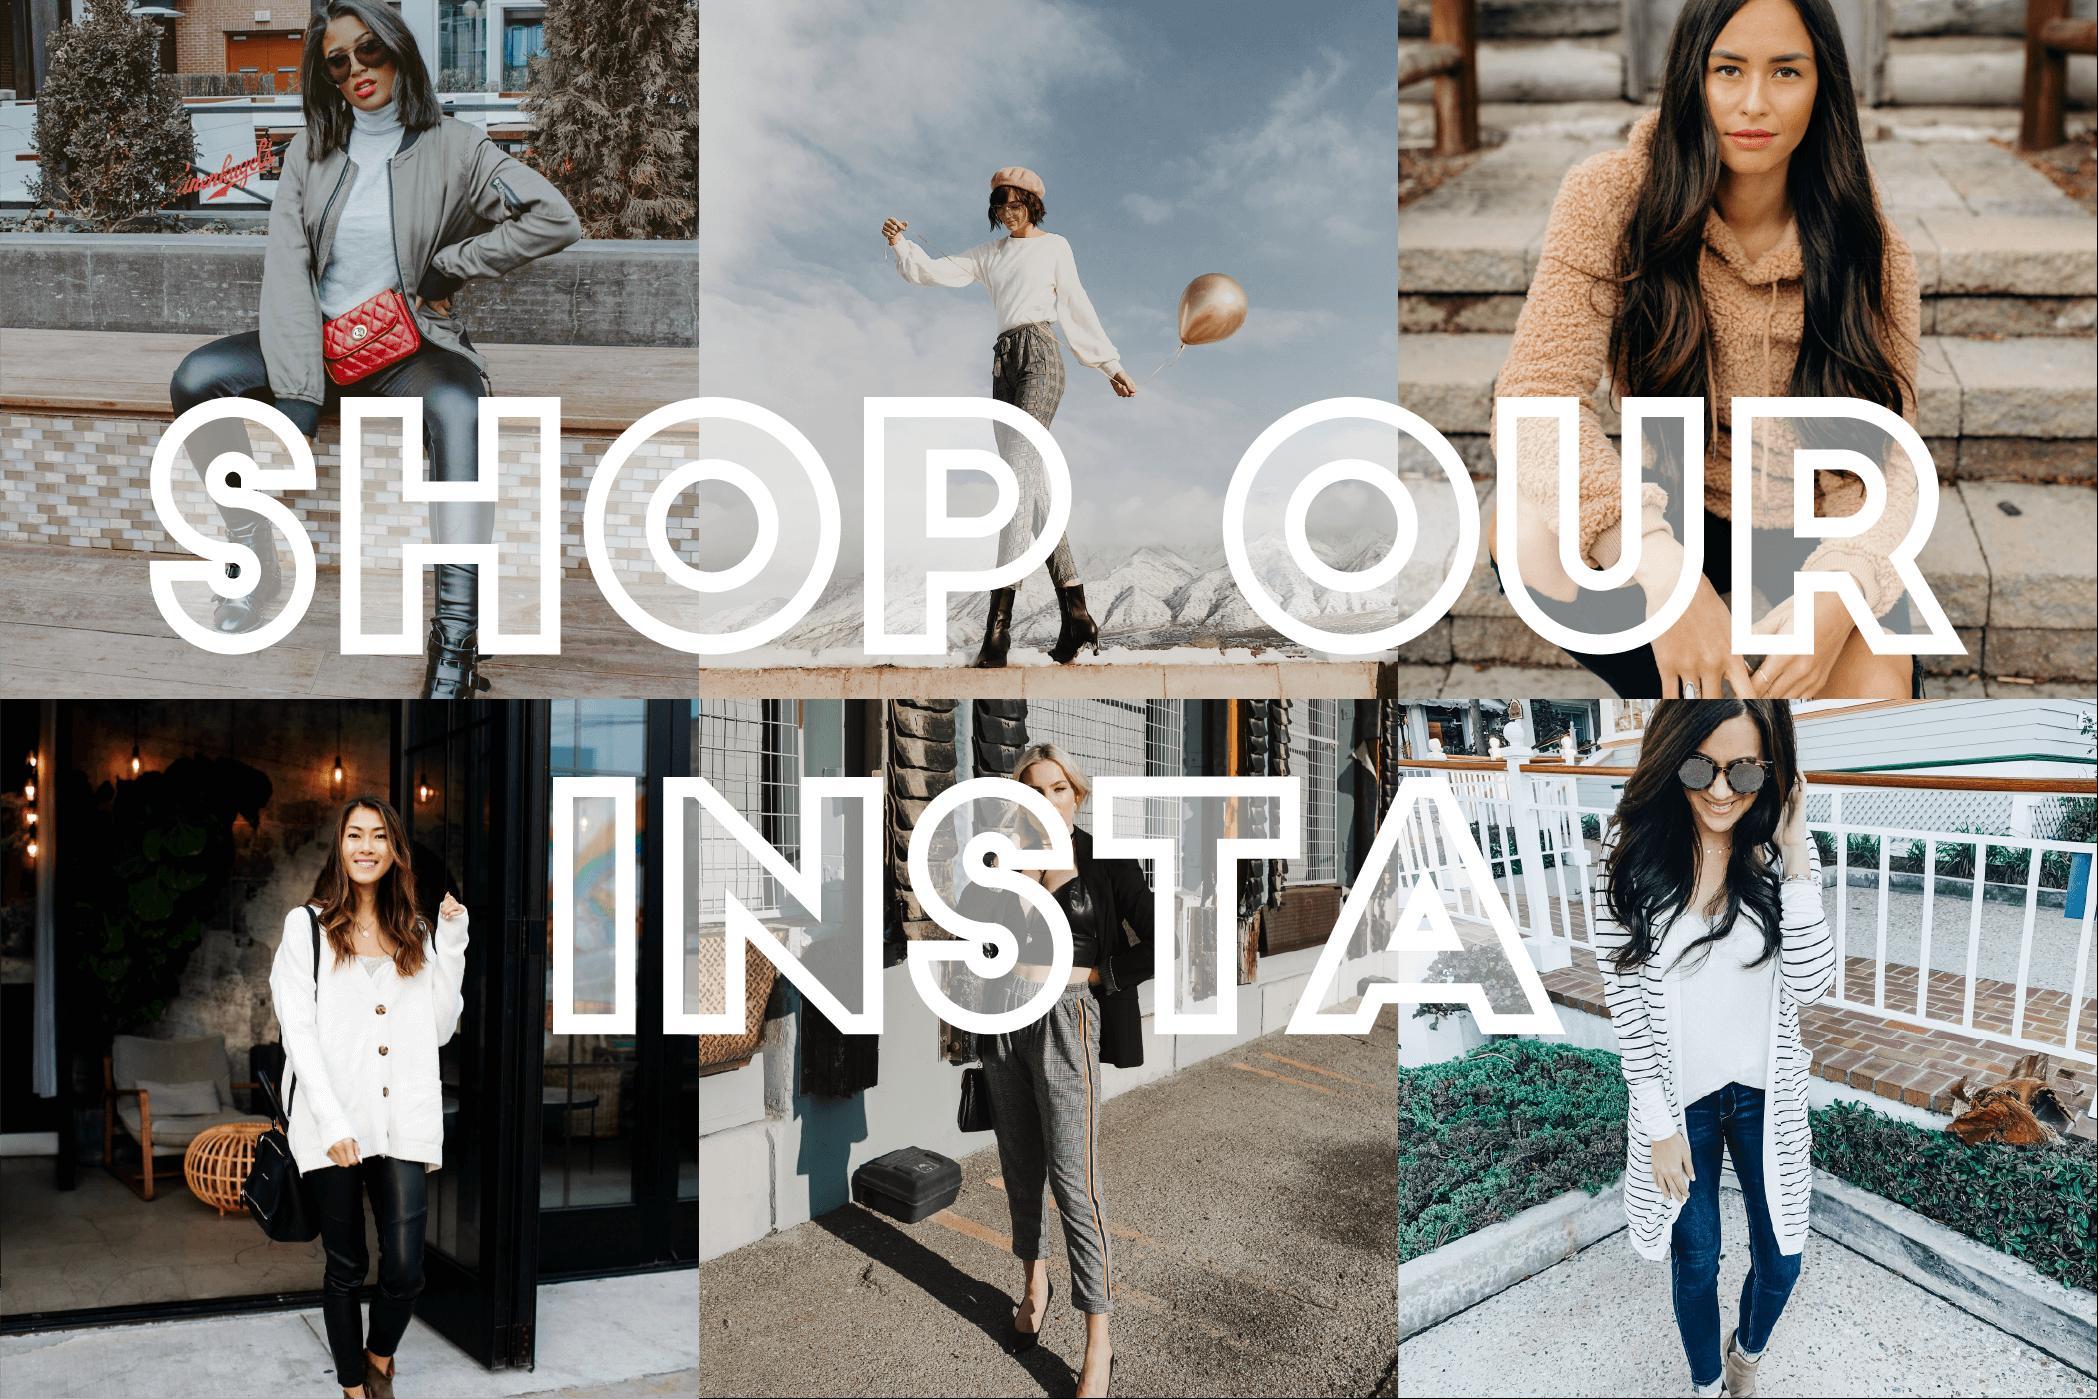 instagram, instagram shop, shop instagram